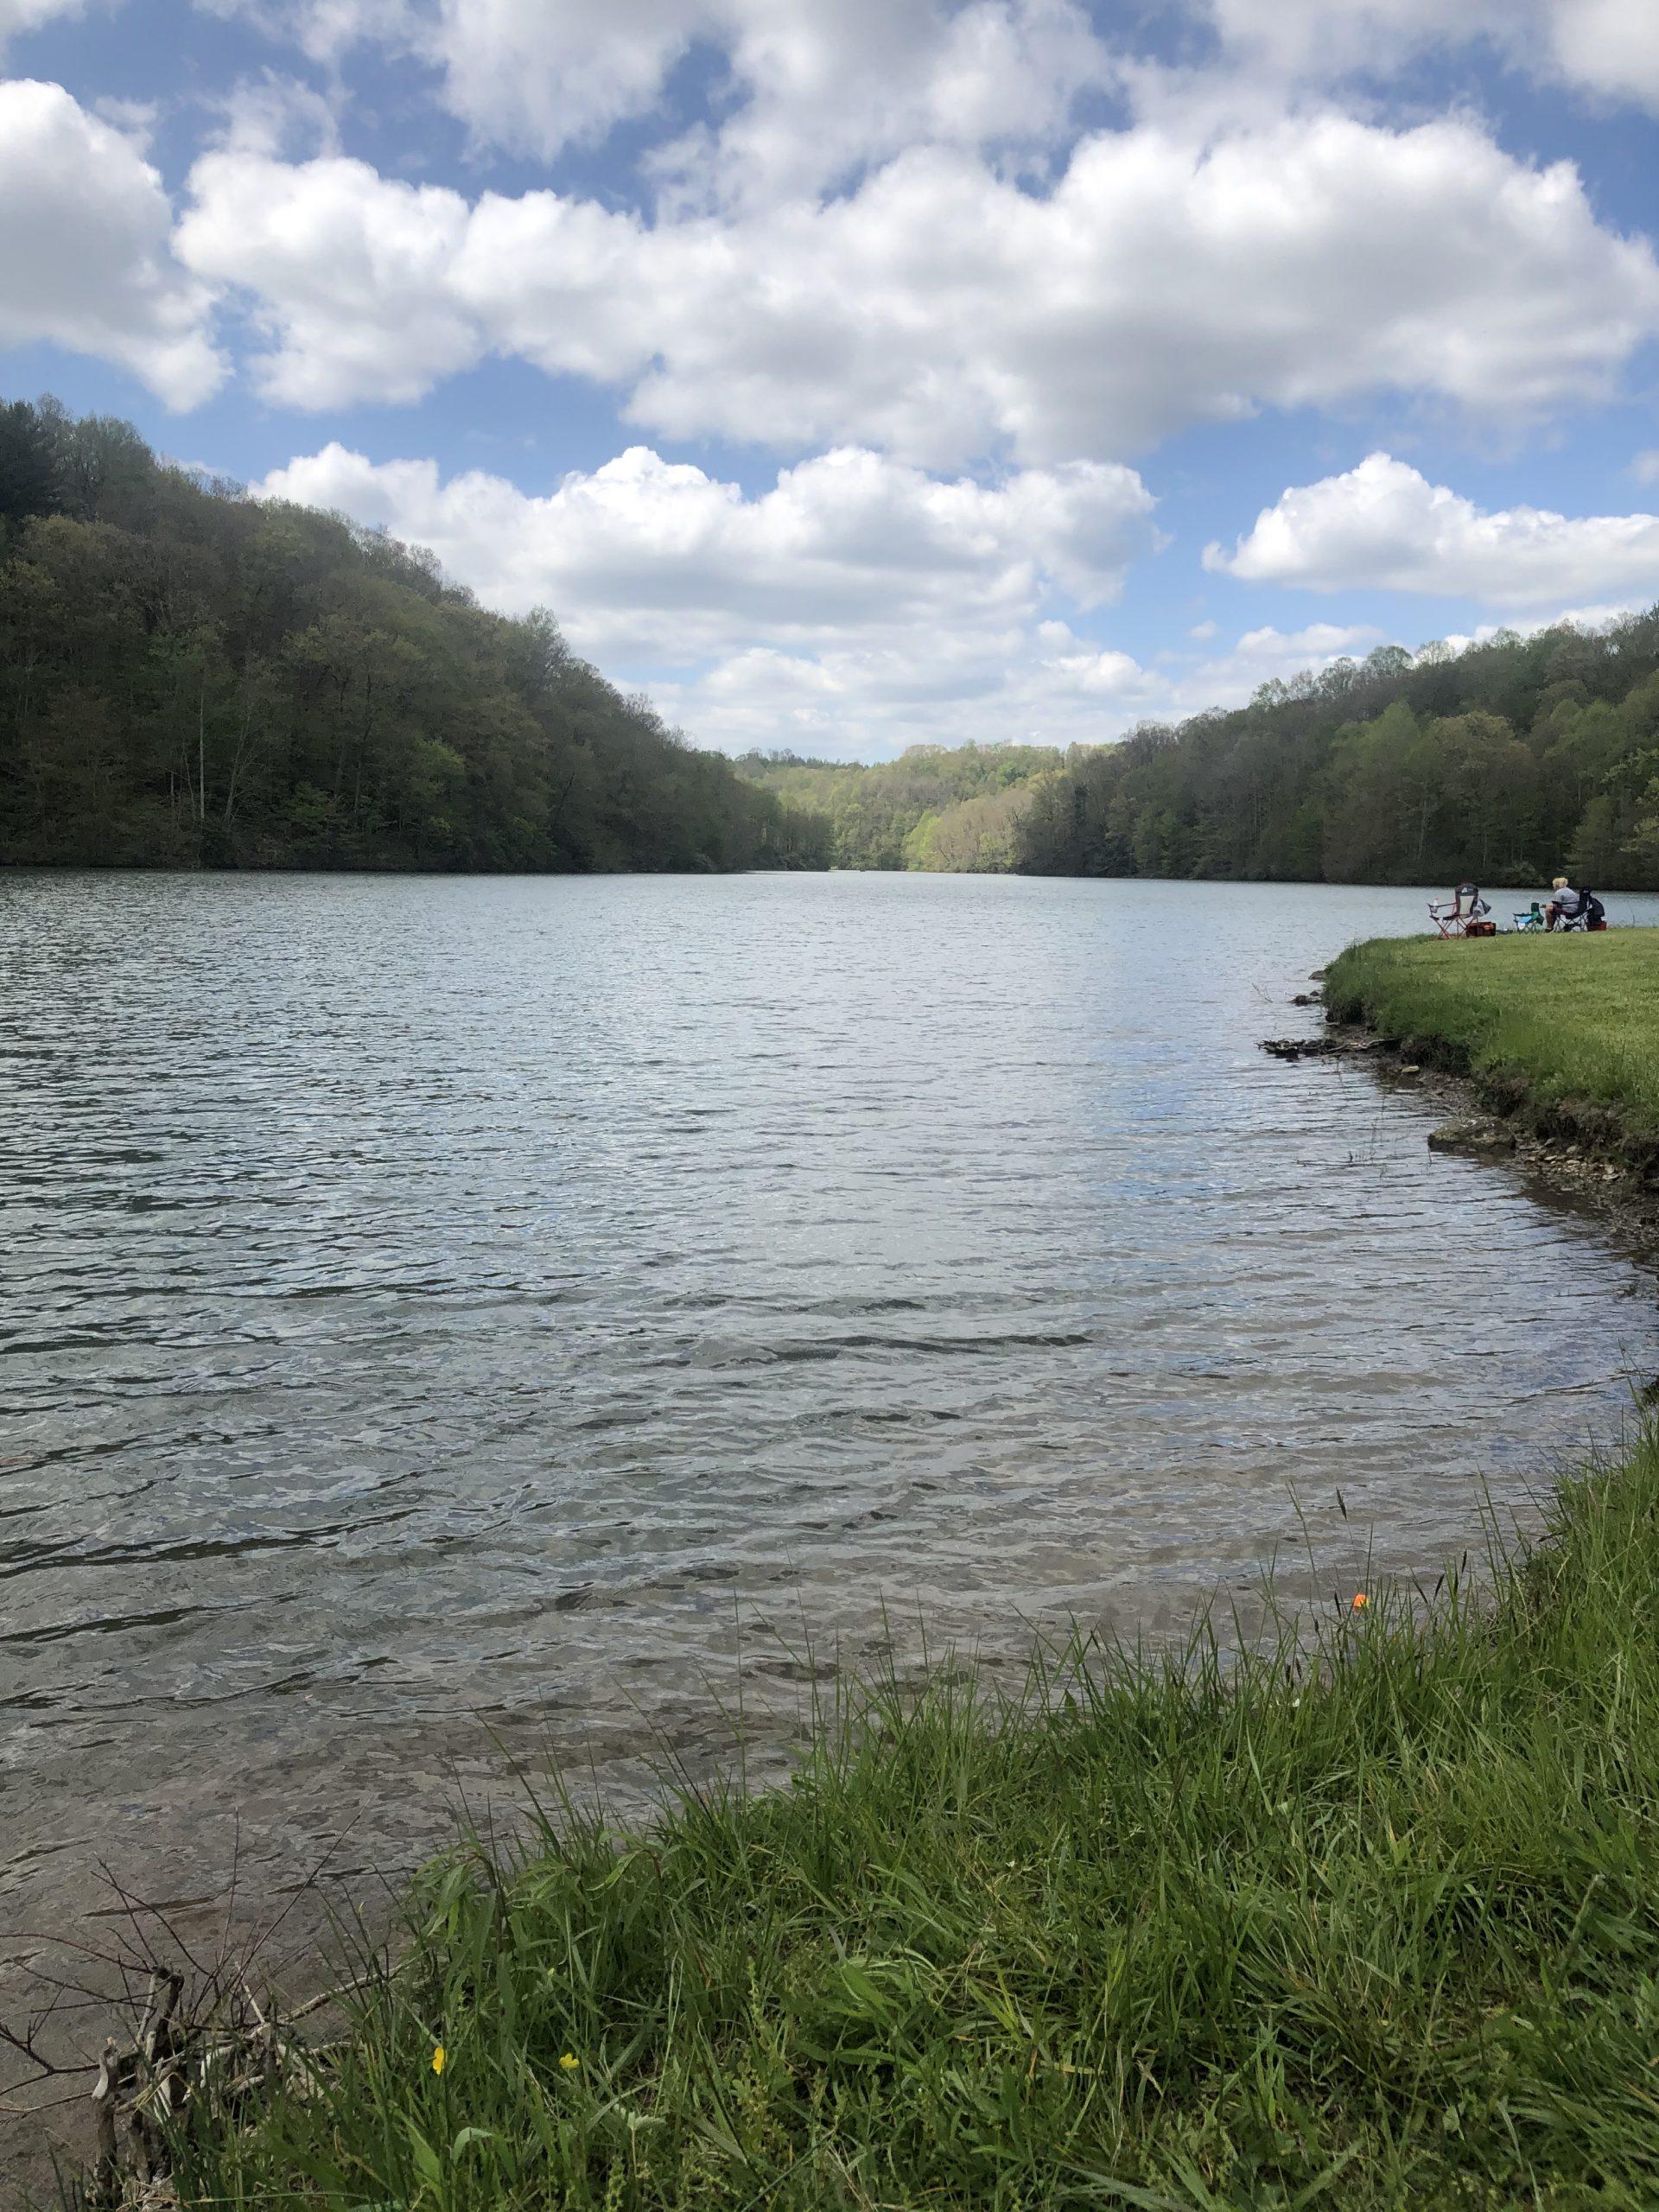 Spend the summer casting a line at Dan Hale Reservoir